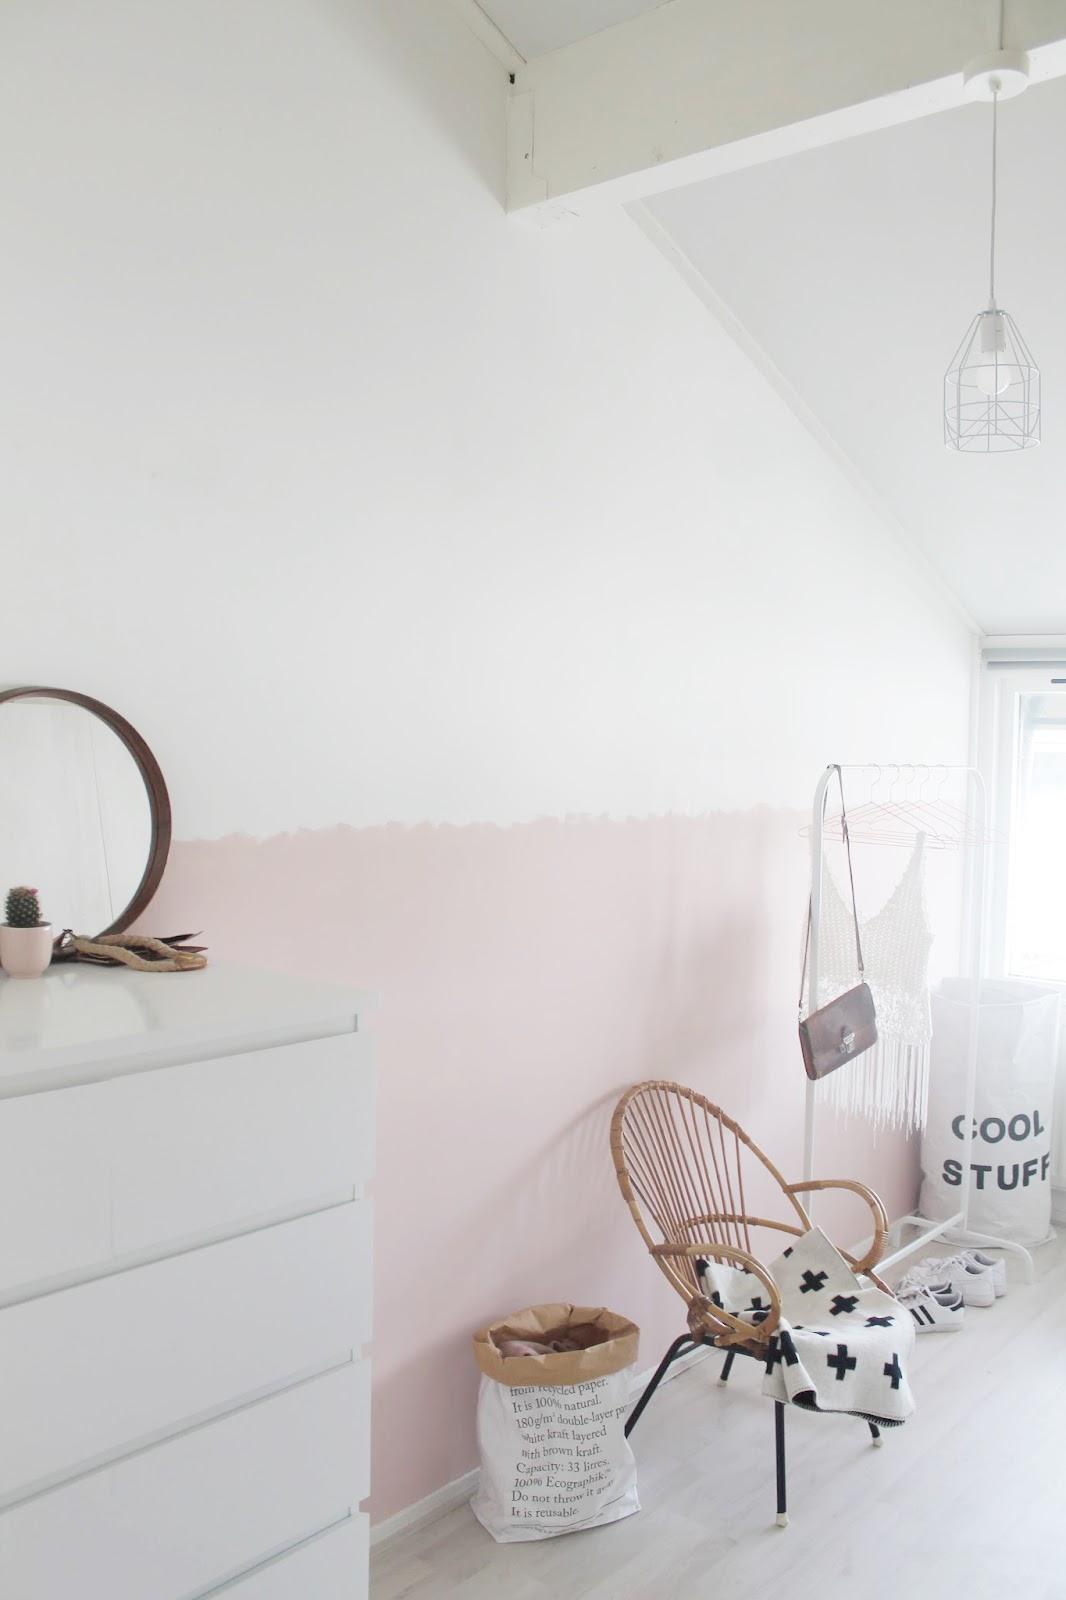 Geliefde Roze Verf | Roze Bloem Number Painting CV99